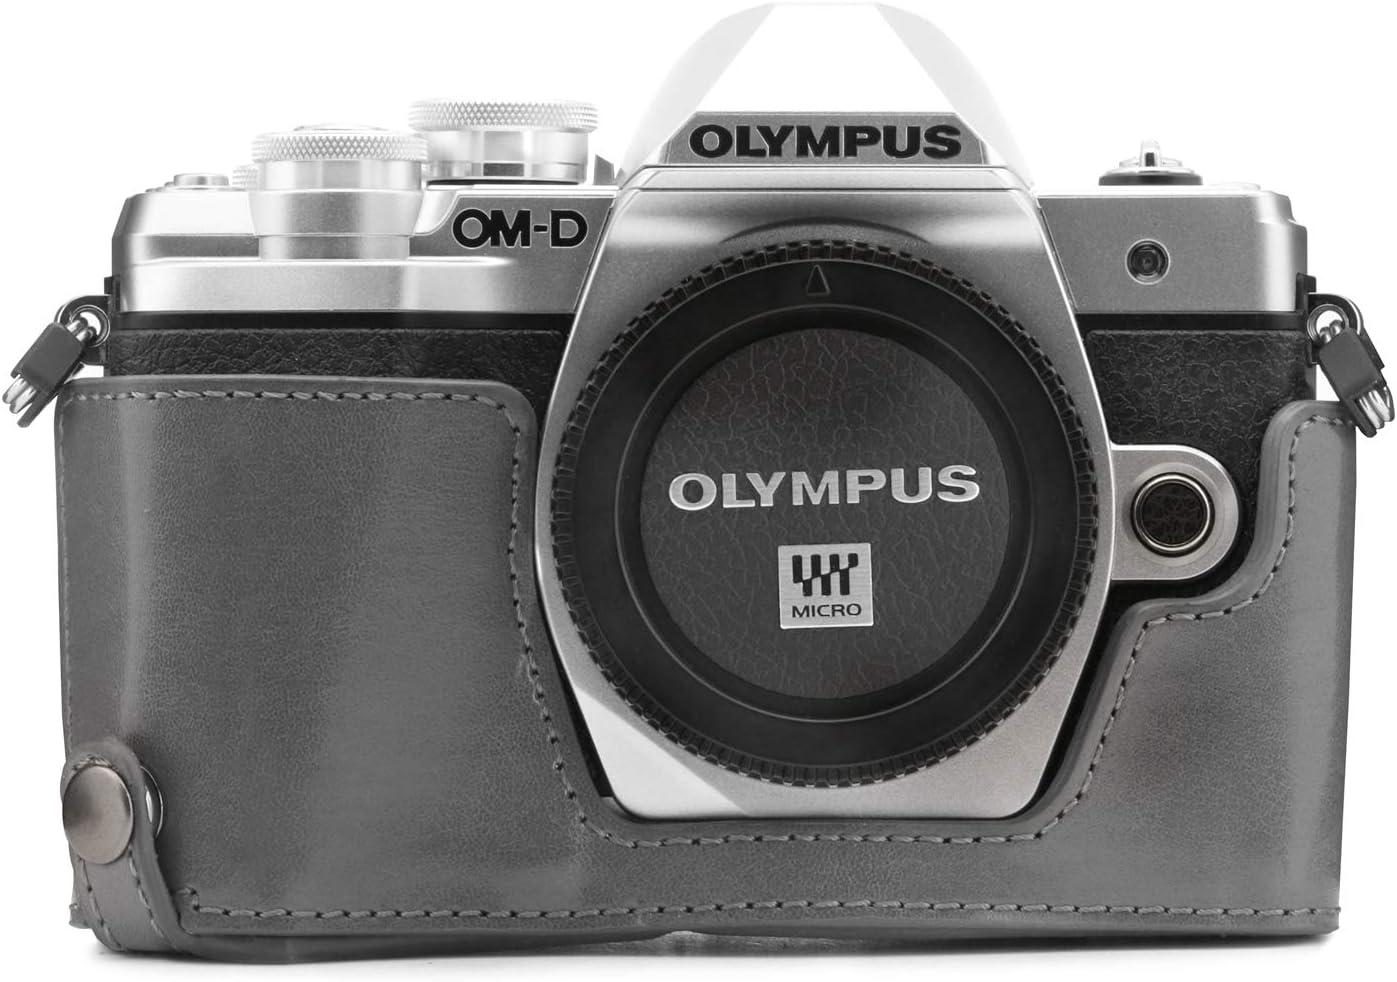 MegaGear Ever Ready Leder Kamera Halbtasche mit Trageriemen kompatibel mit Olympus OM-D E-M10 Mark III